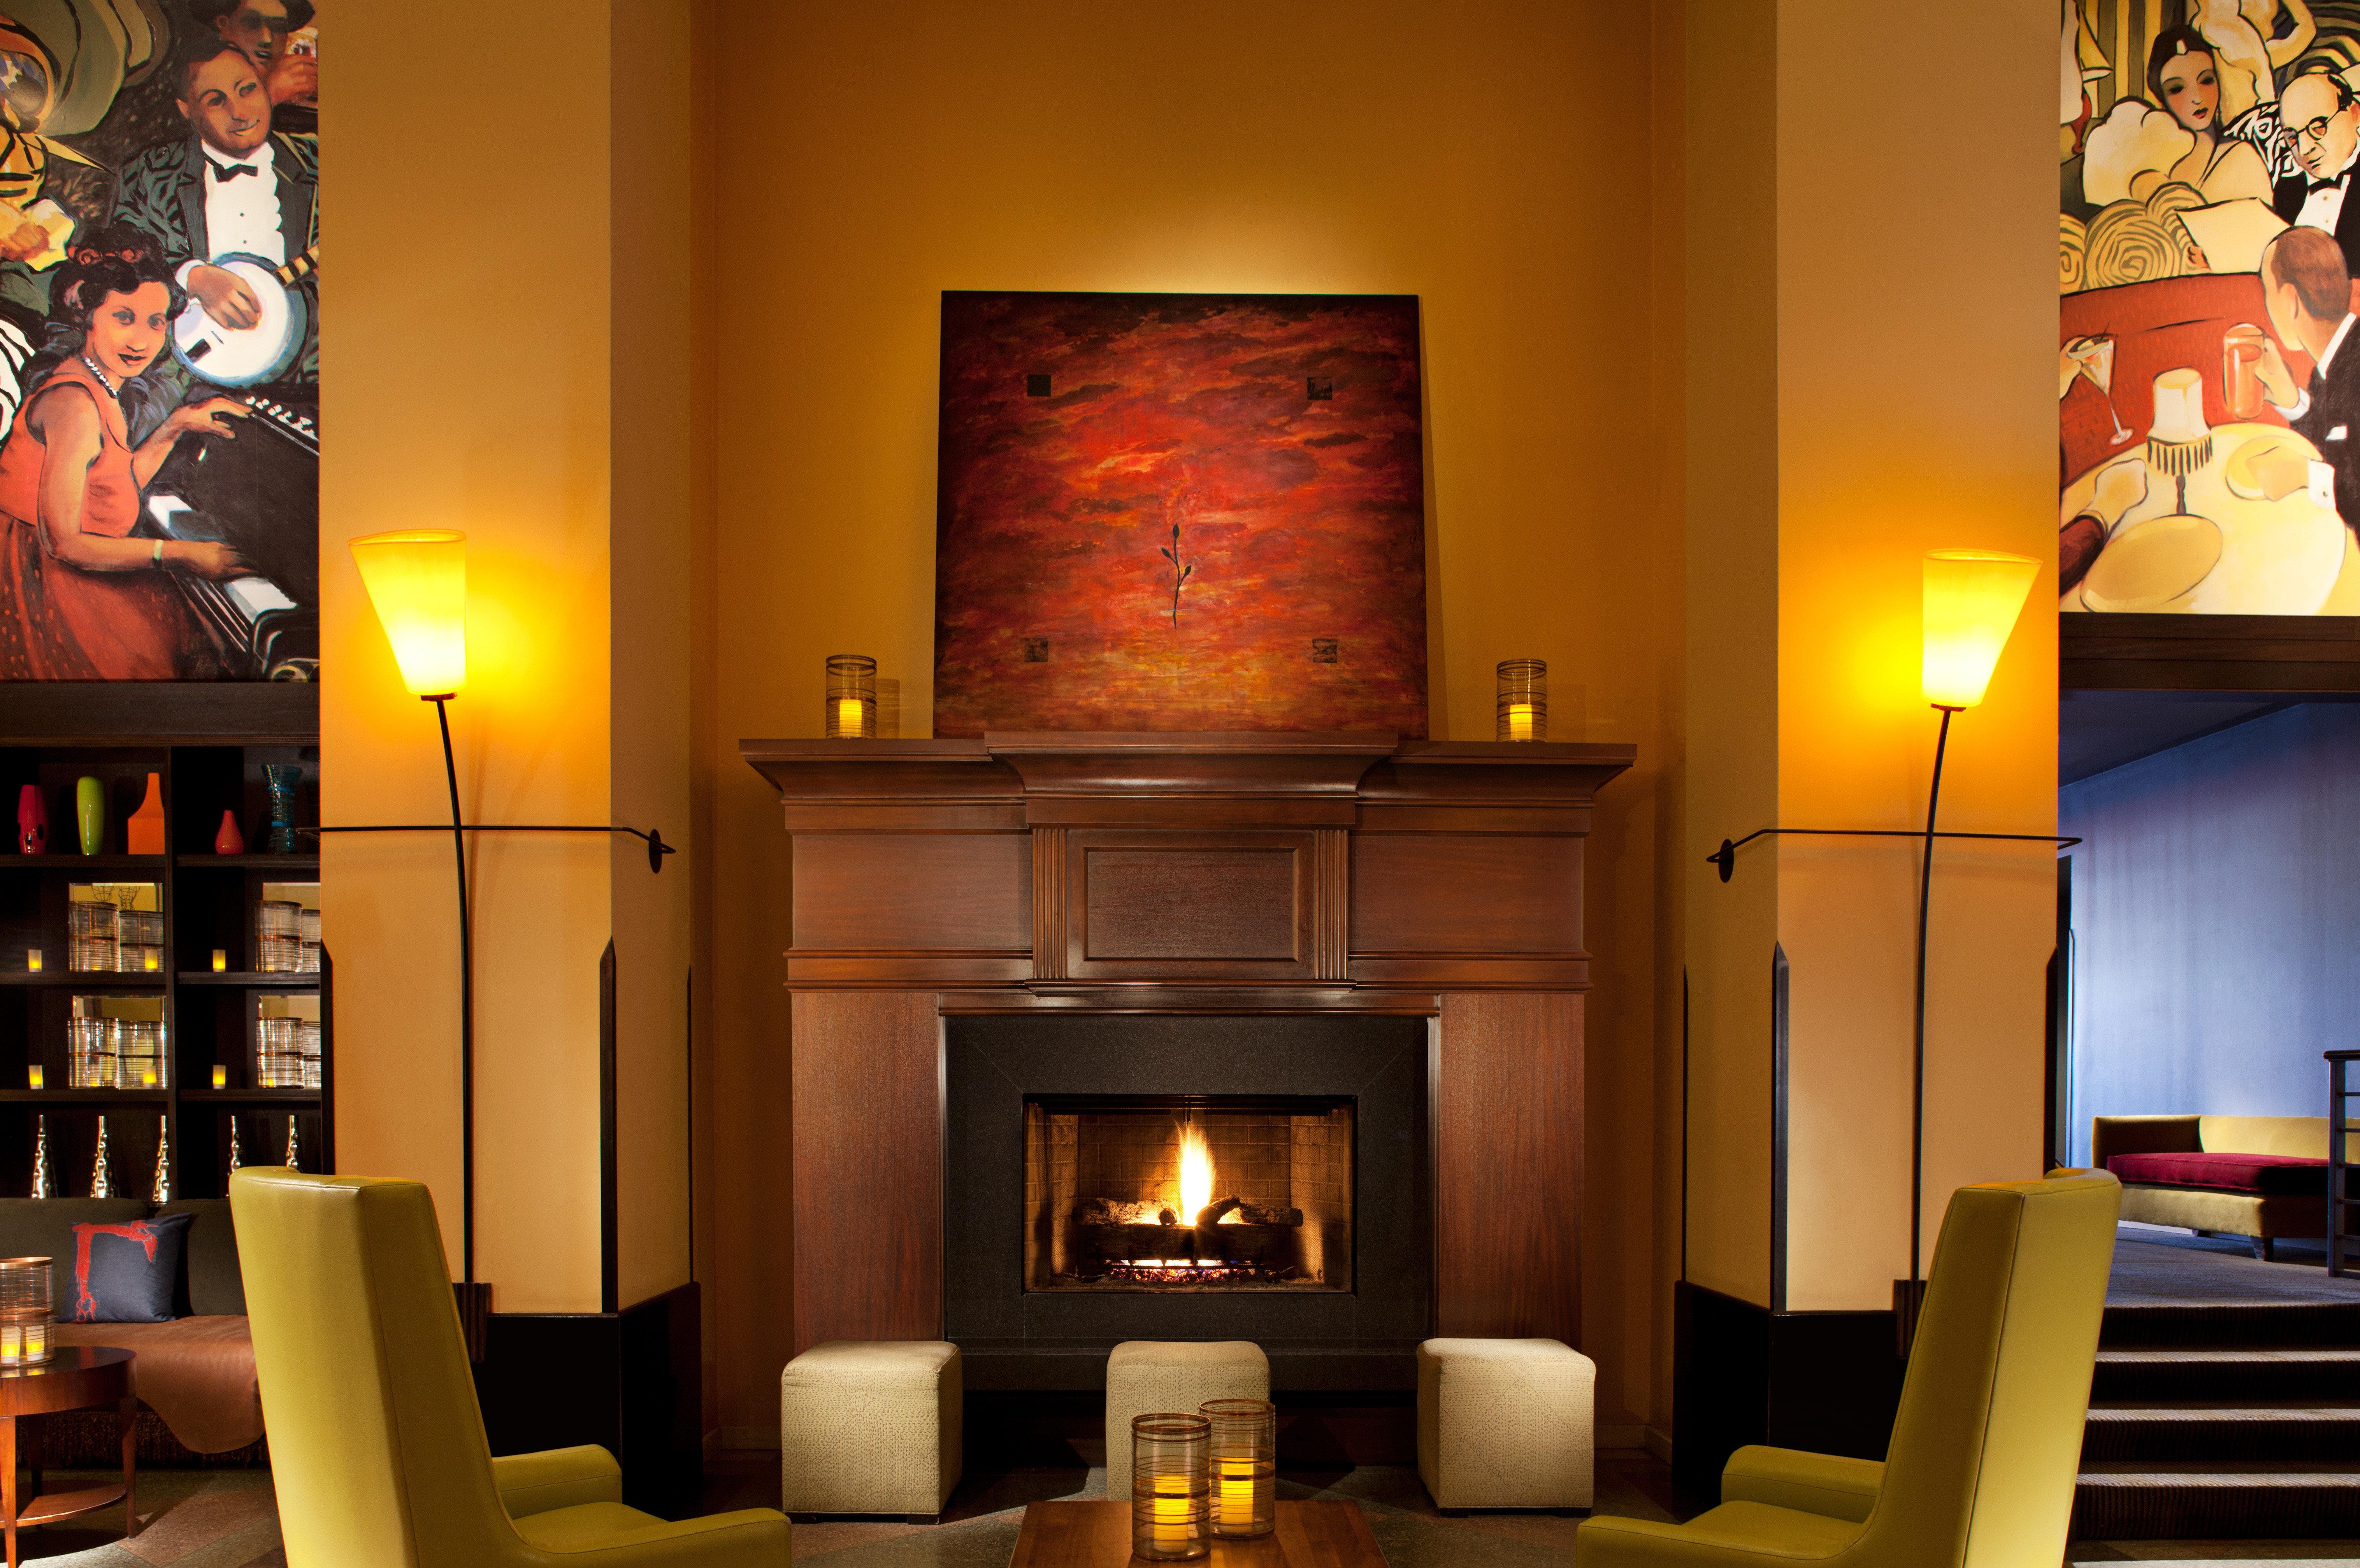 Fireplace Historic Lobby Lounge Modern hearth lighting living room